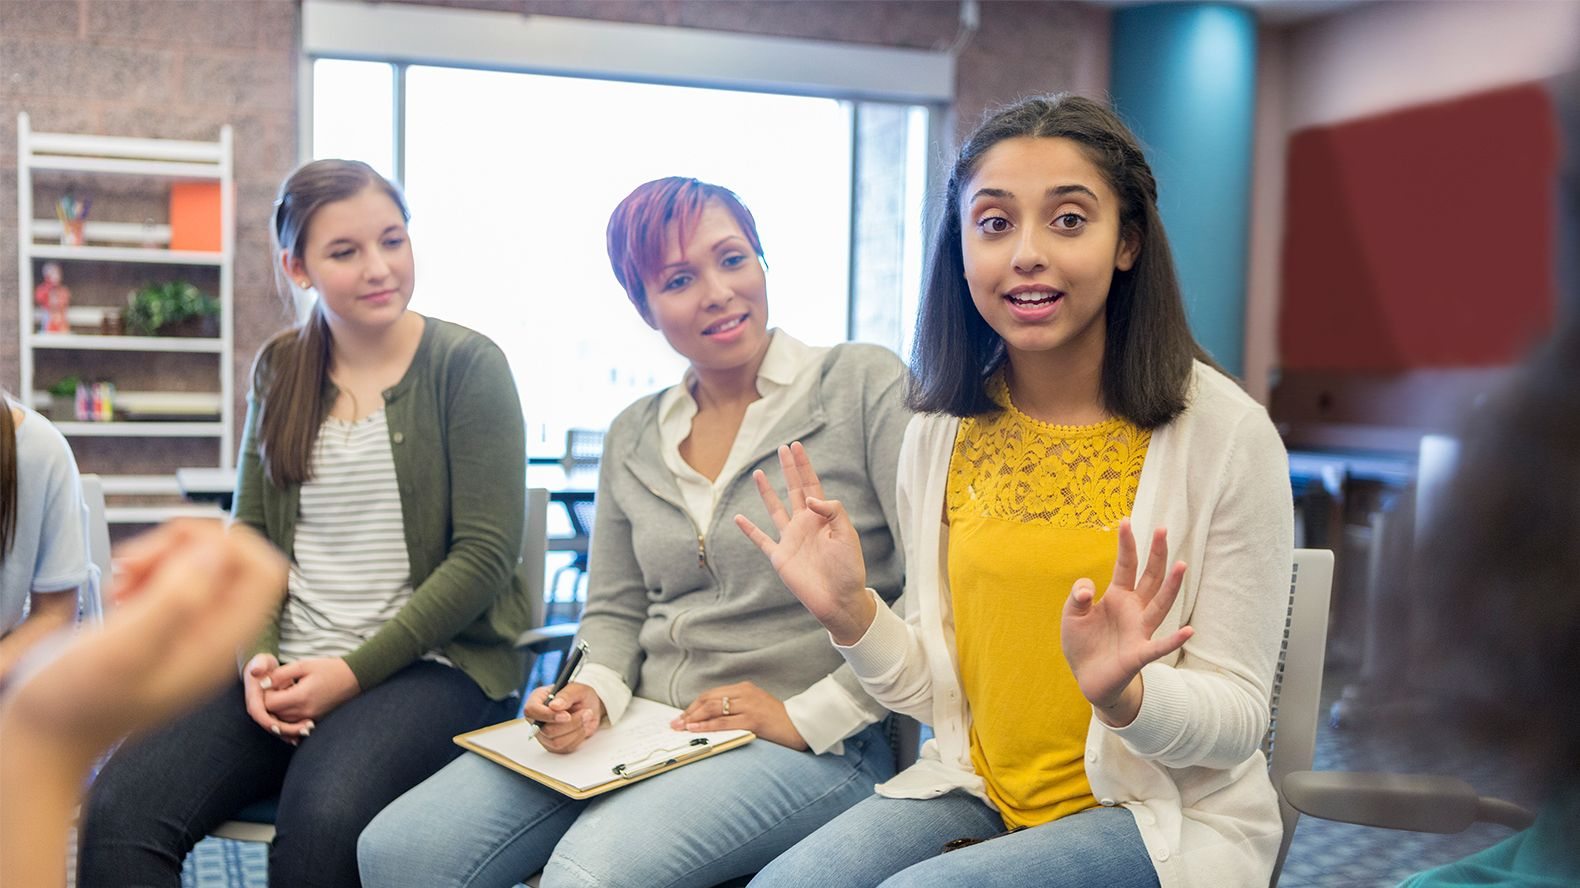 Strengthening Student Relationships Through Oral Storytelling